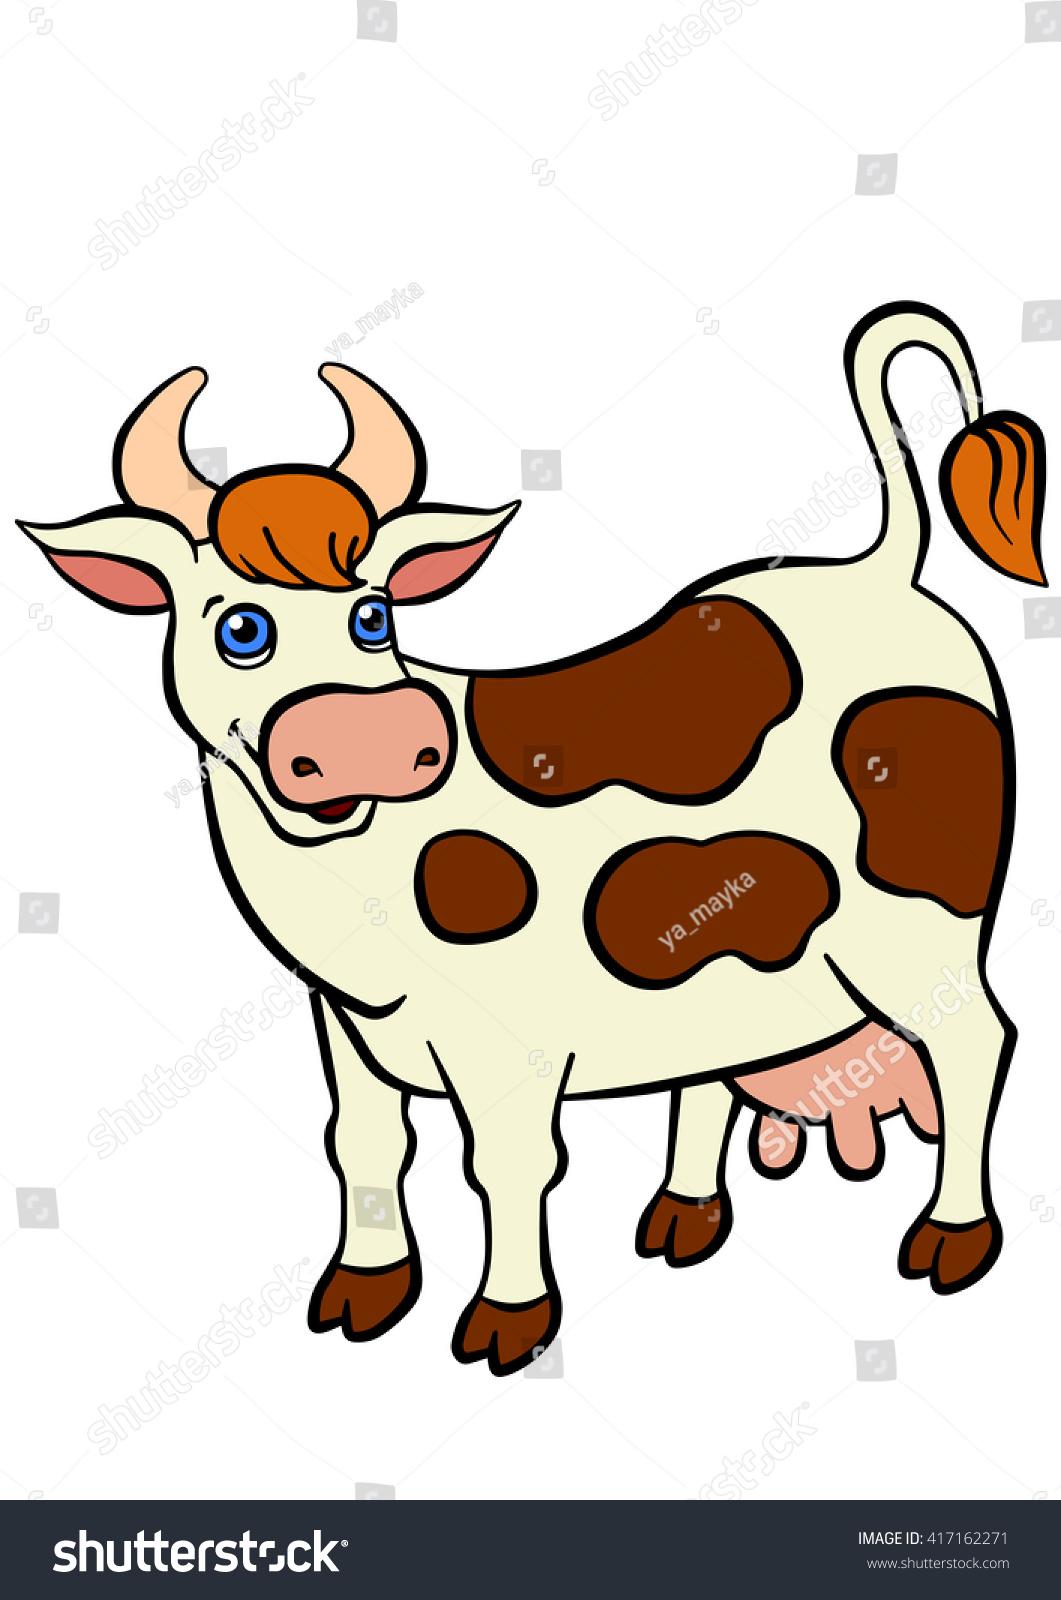 Farm Baby Animals Clipart / Cute Animal Clipart / Barnyard | Etsy | Cute animal  clipart, Animal clipart, Barnyard animals